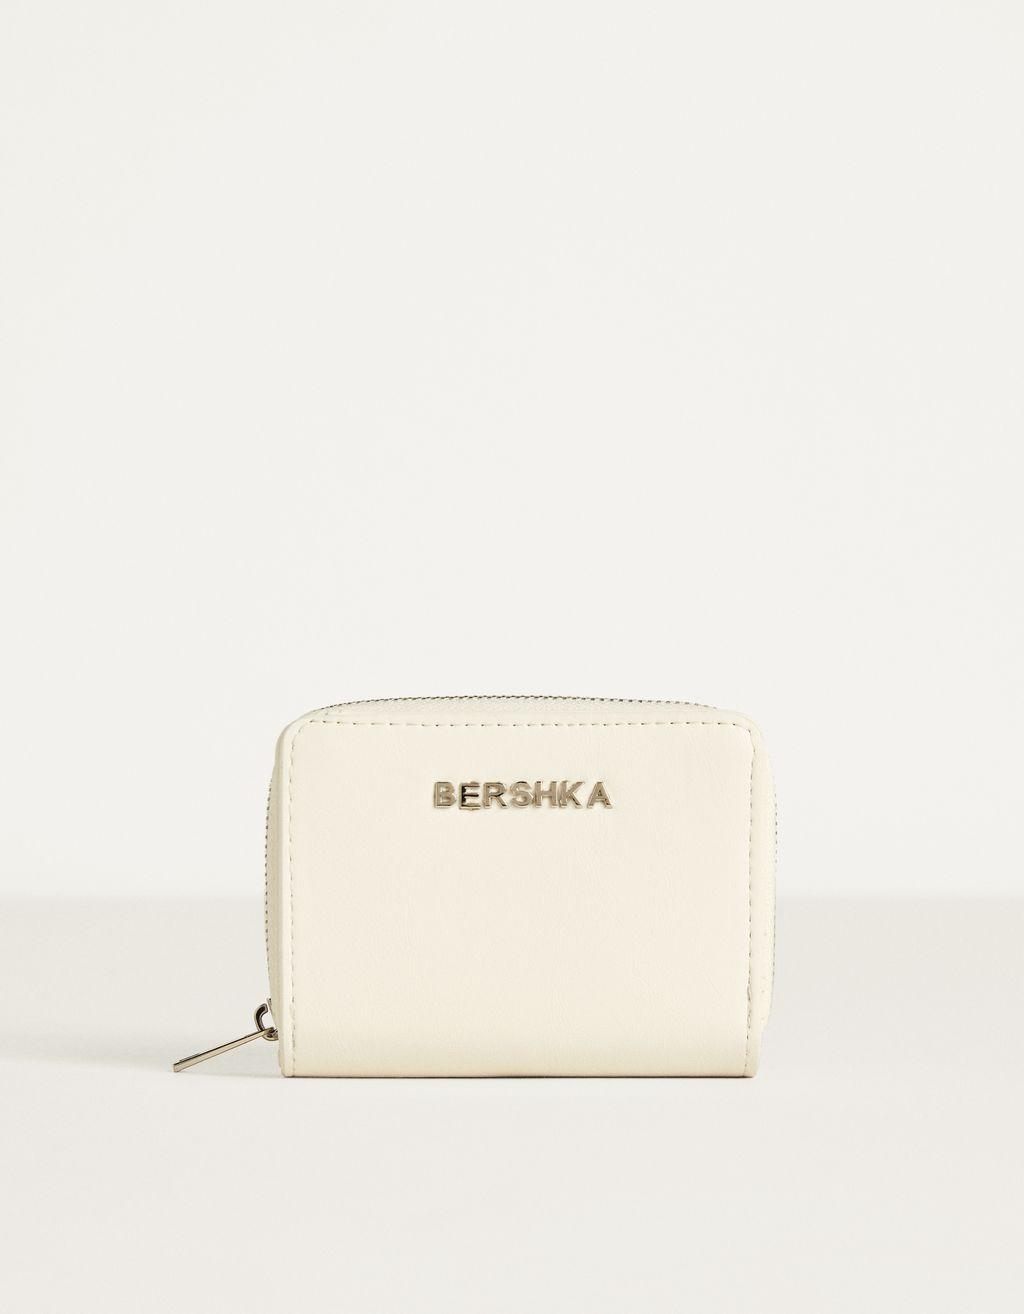 Monochrome purse